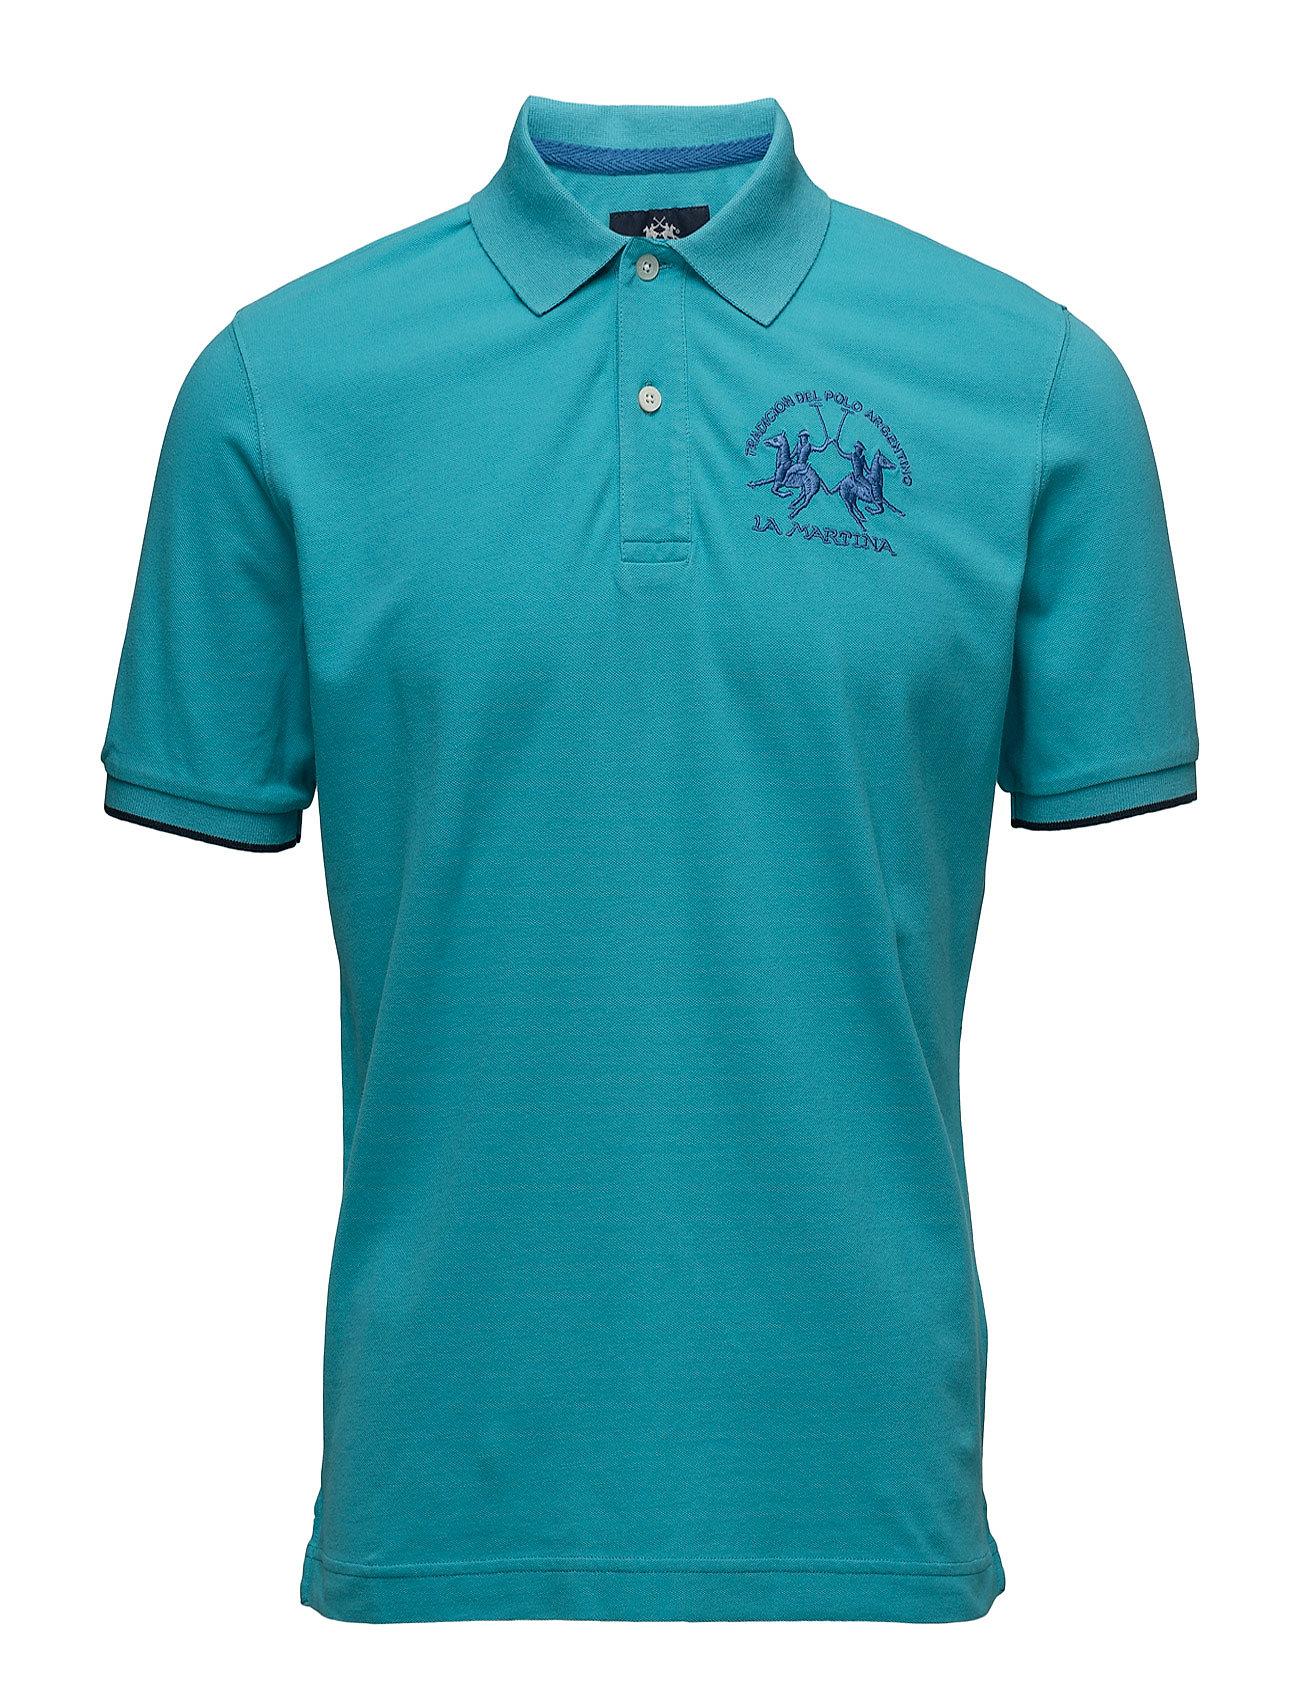 La Martina-Polos La Martina Polo t-shirts til Mænd i